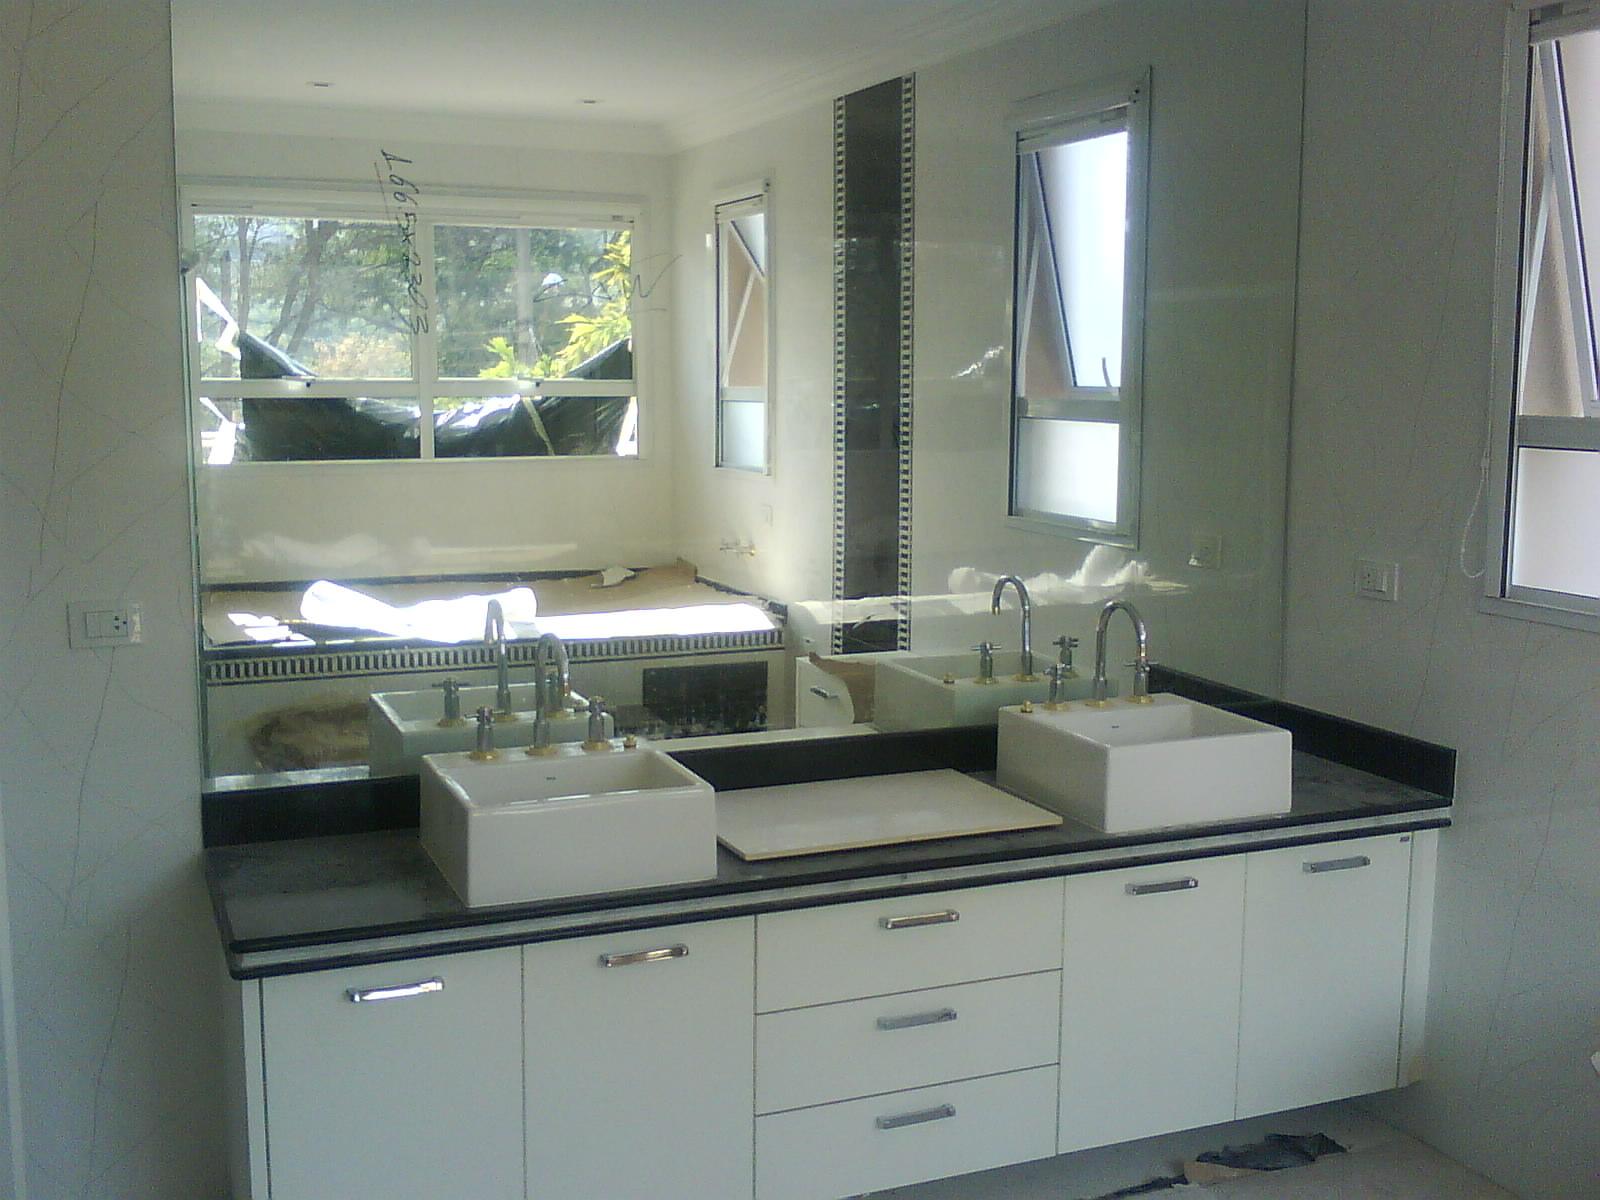 VIPaulo Vidros e Box: Espelhos box jateado pia de vidro divisórias  #556076 1600 1200